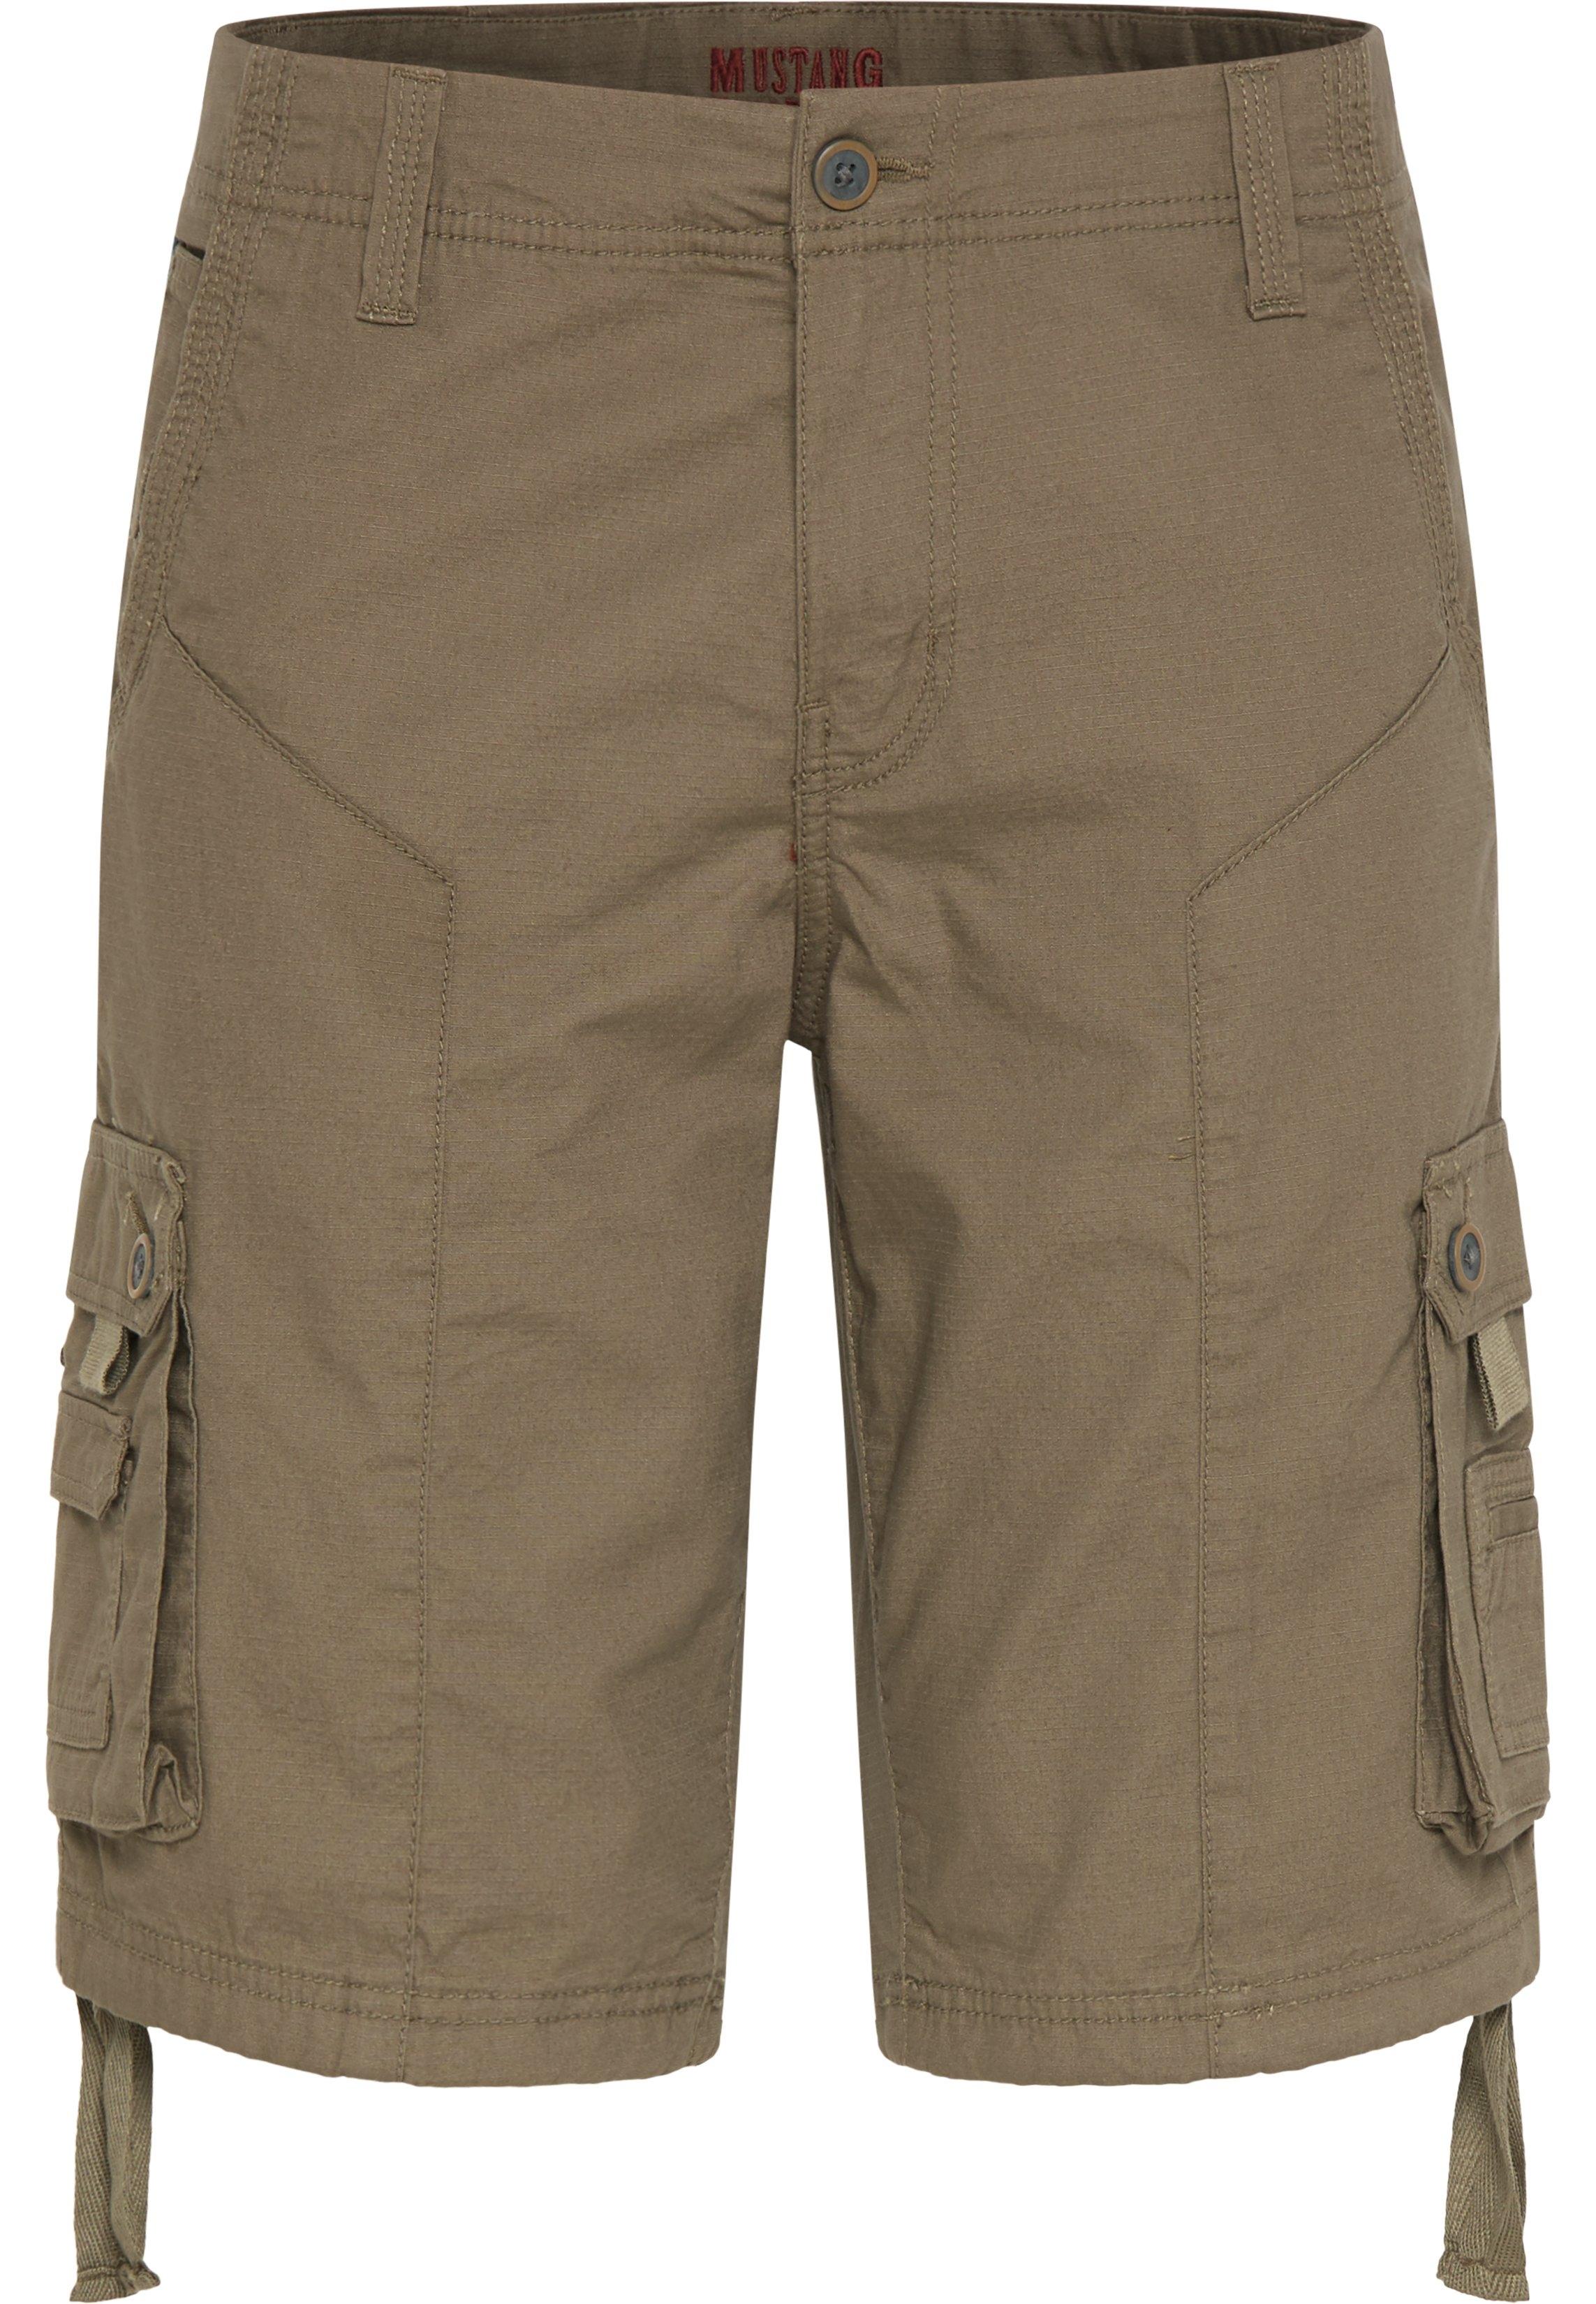 MUSTANG jeansshort »Cargo Shorts« - verschillende betaalmethodes